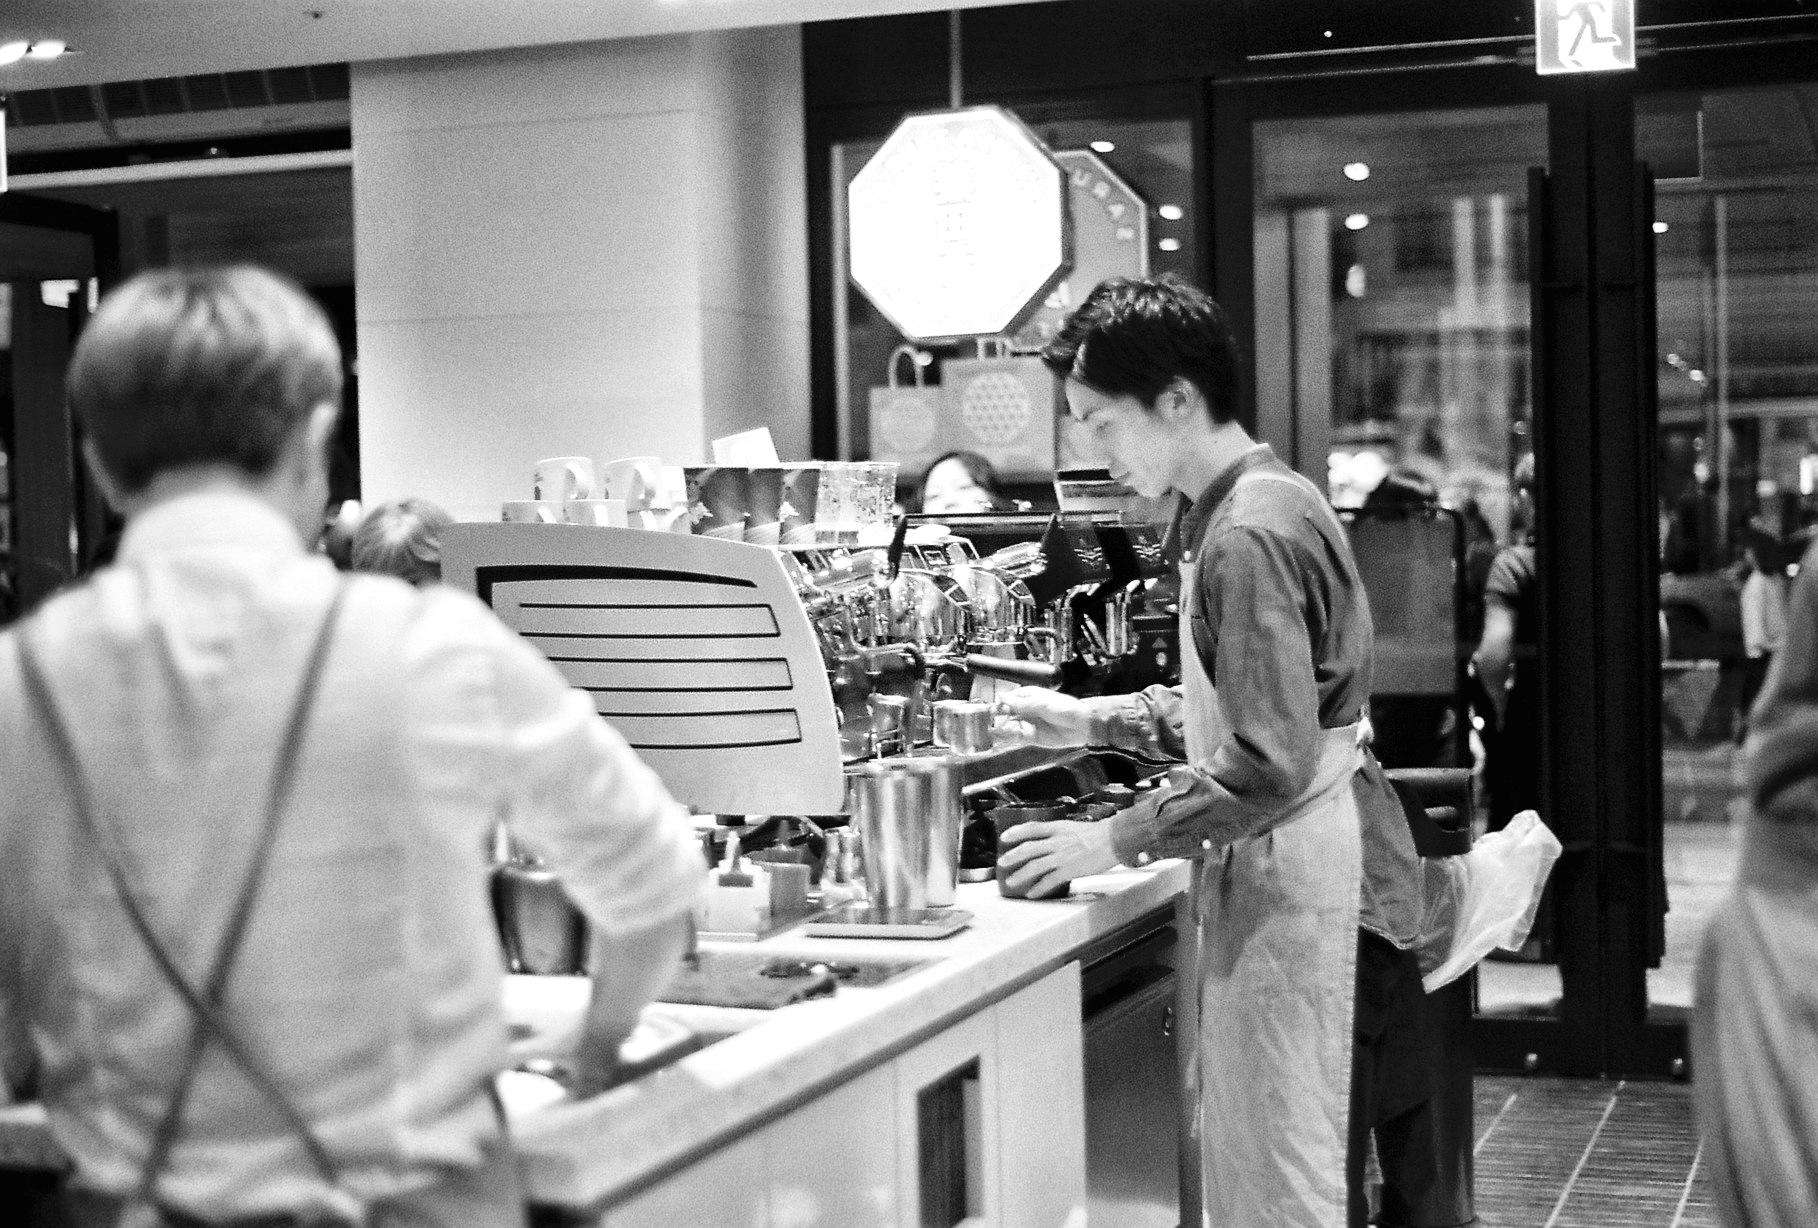 espresso time by nonstopstudio